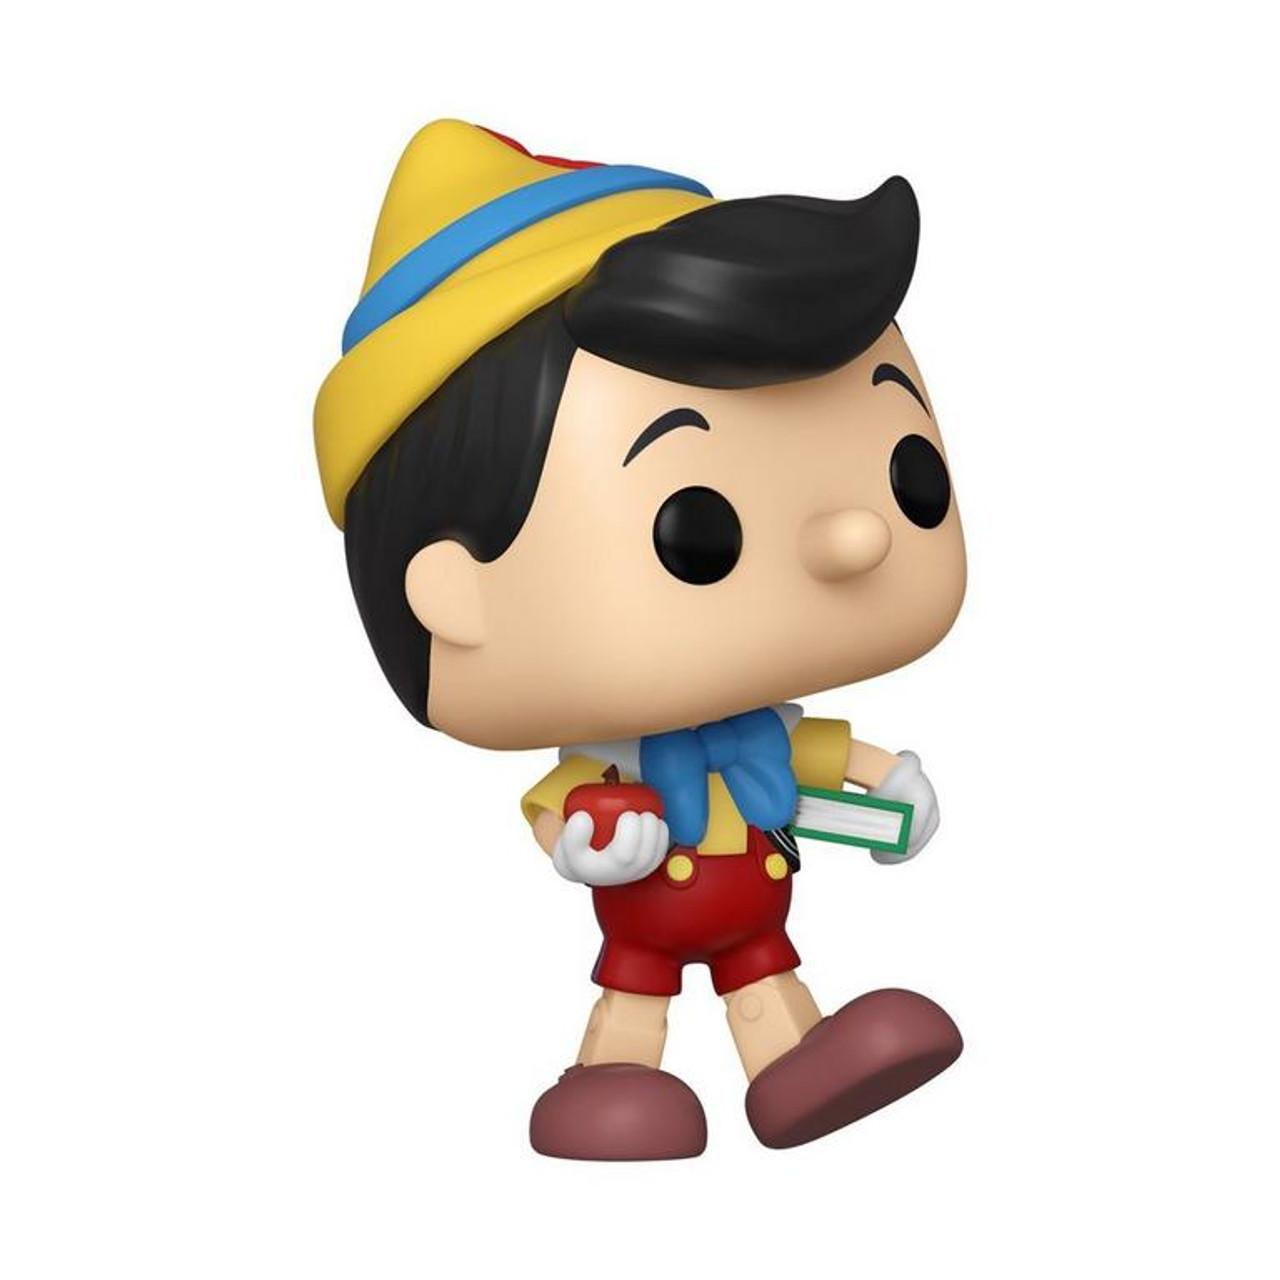 POP! Disney ~ Pinocchio ~ Pinocchio #1029